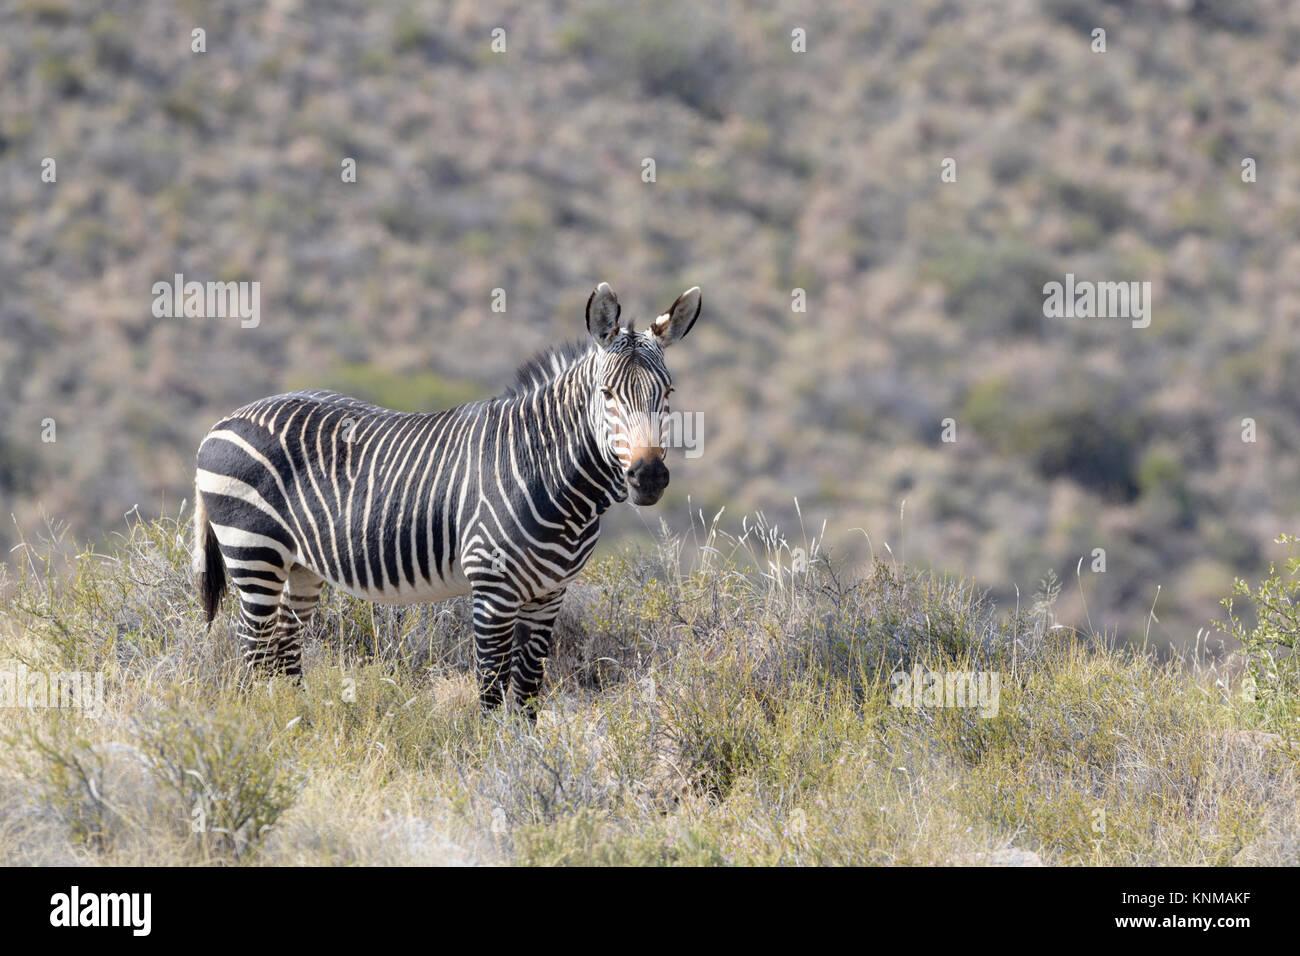 Mountain Zebra (Equus zebra) standing in grassland, Mountain Zebra National Park, South Africa Stock Photo